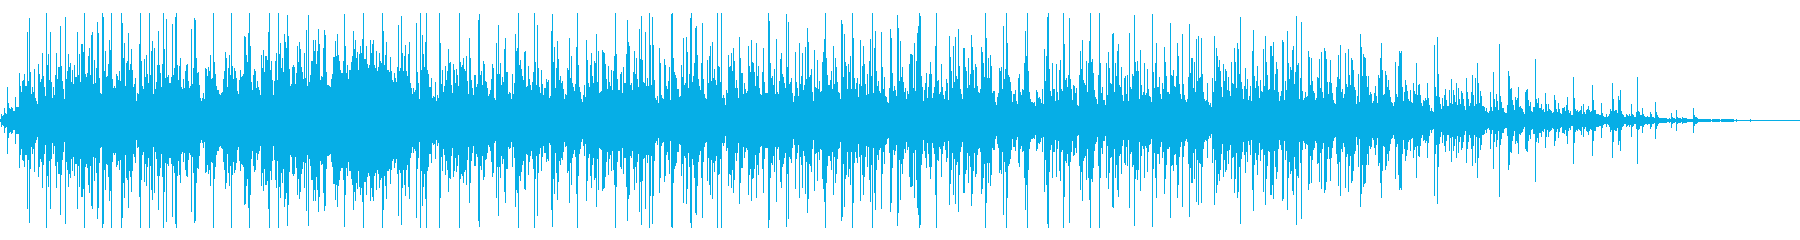 es16051 中劇場拍手_10.wavの再生済みの波形